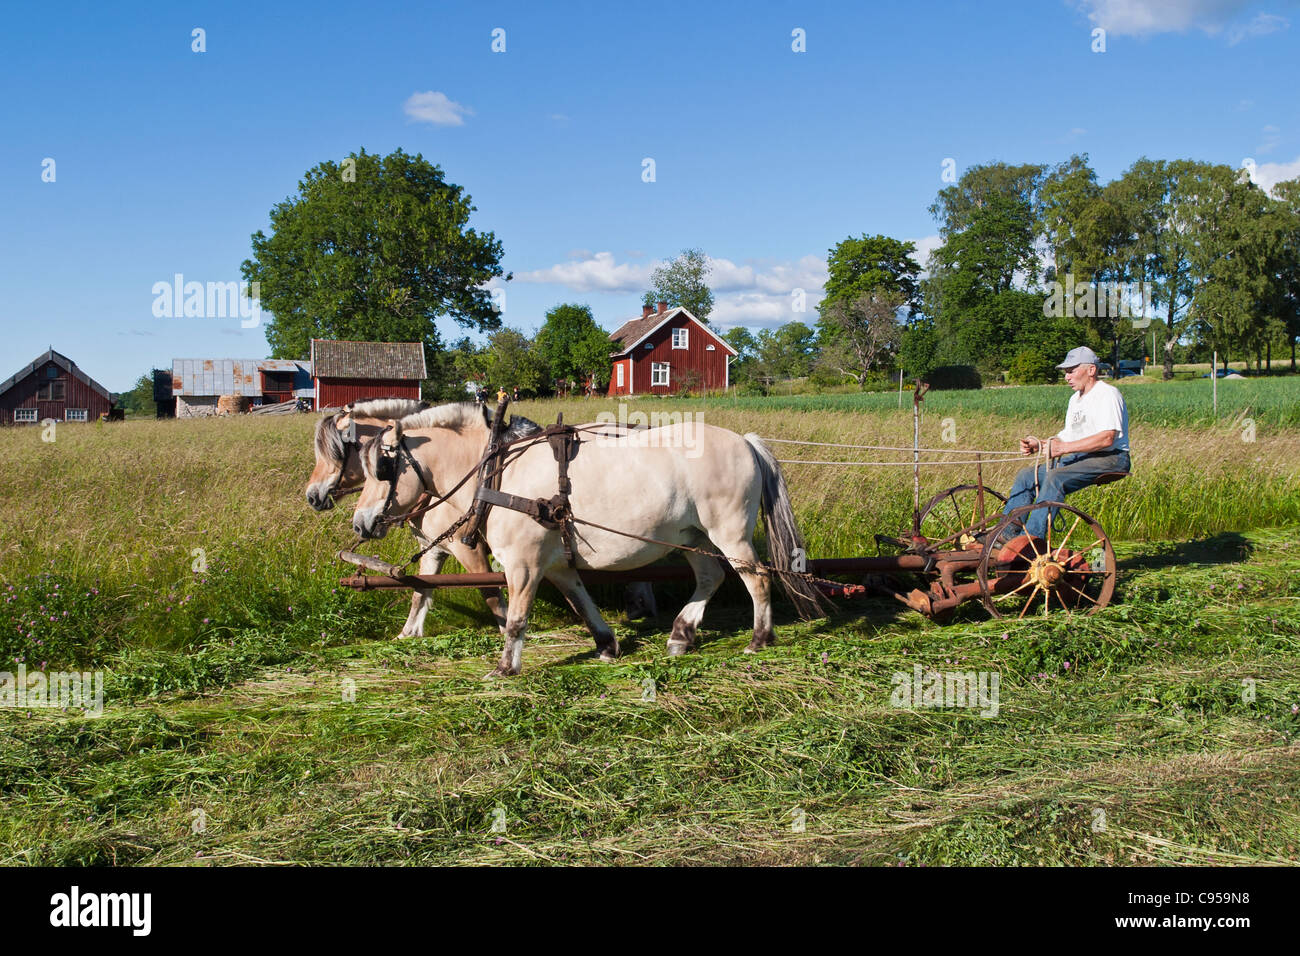 Horse Drawn Hay Mower Stock Photos & Horse Drawn Hay Mower